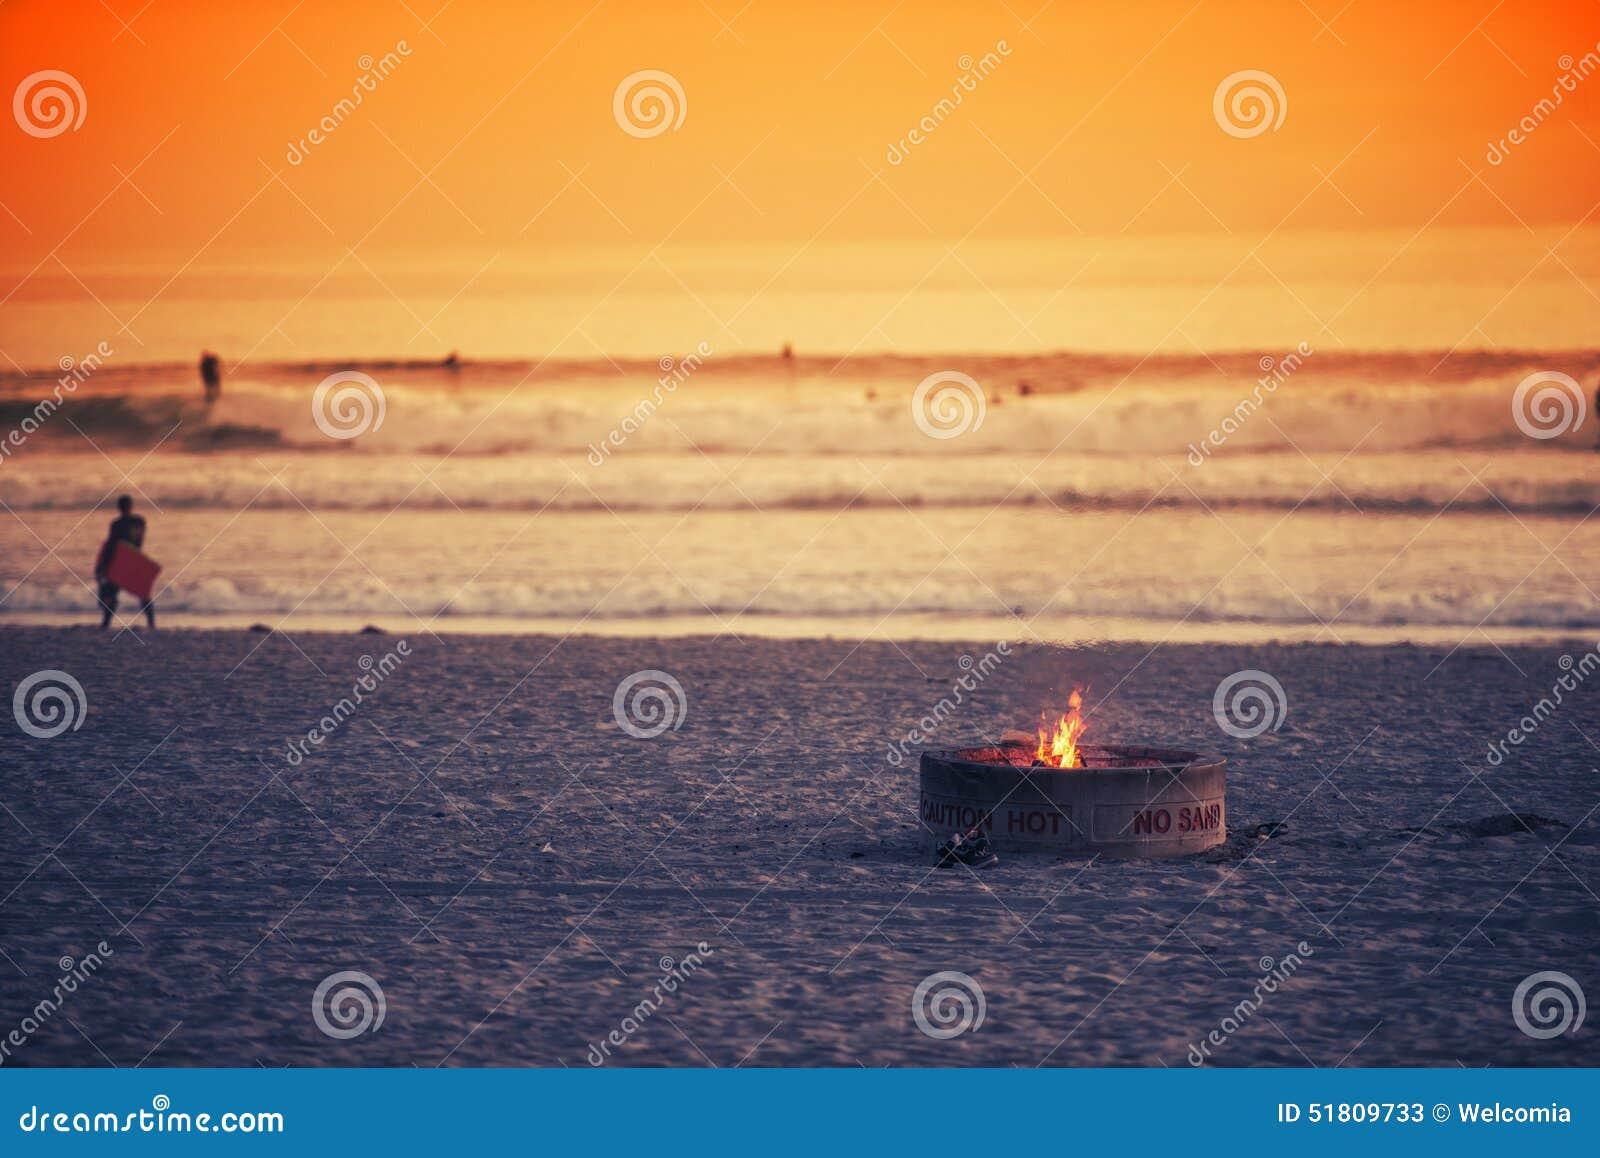 Beach Fire Pit Stock Photo - Image: 51809733